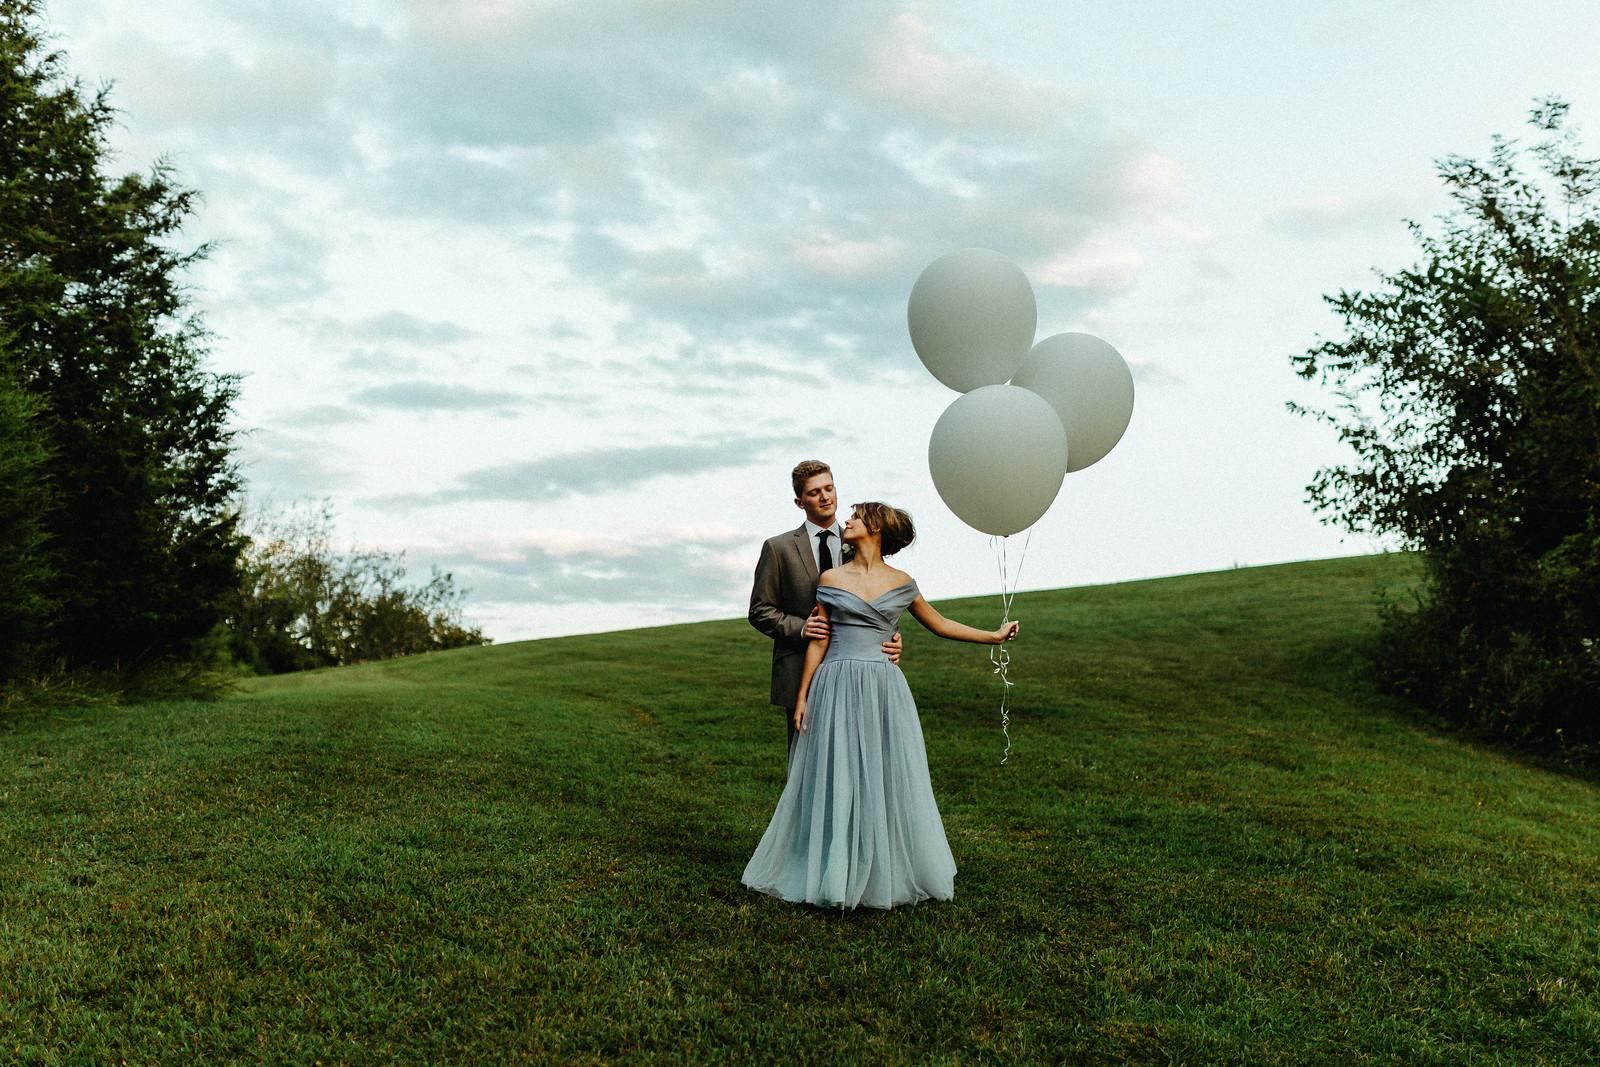 hill balloons.jpg